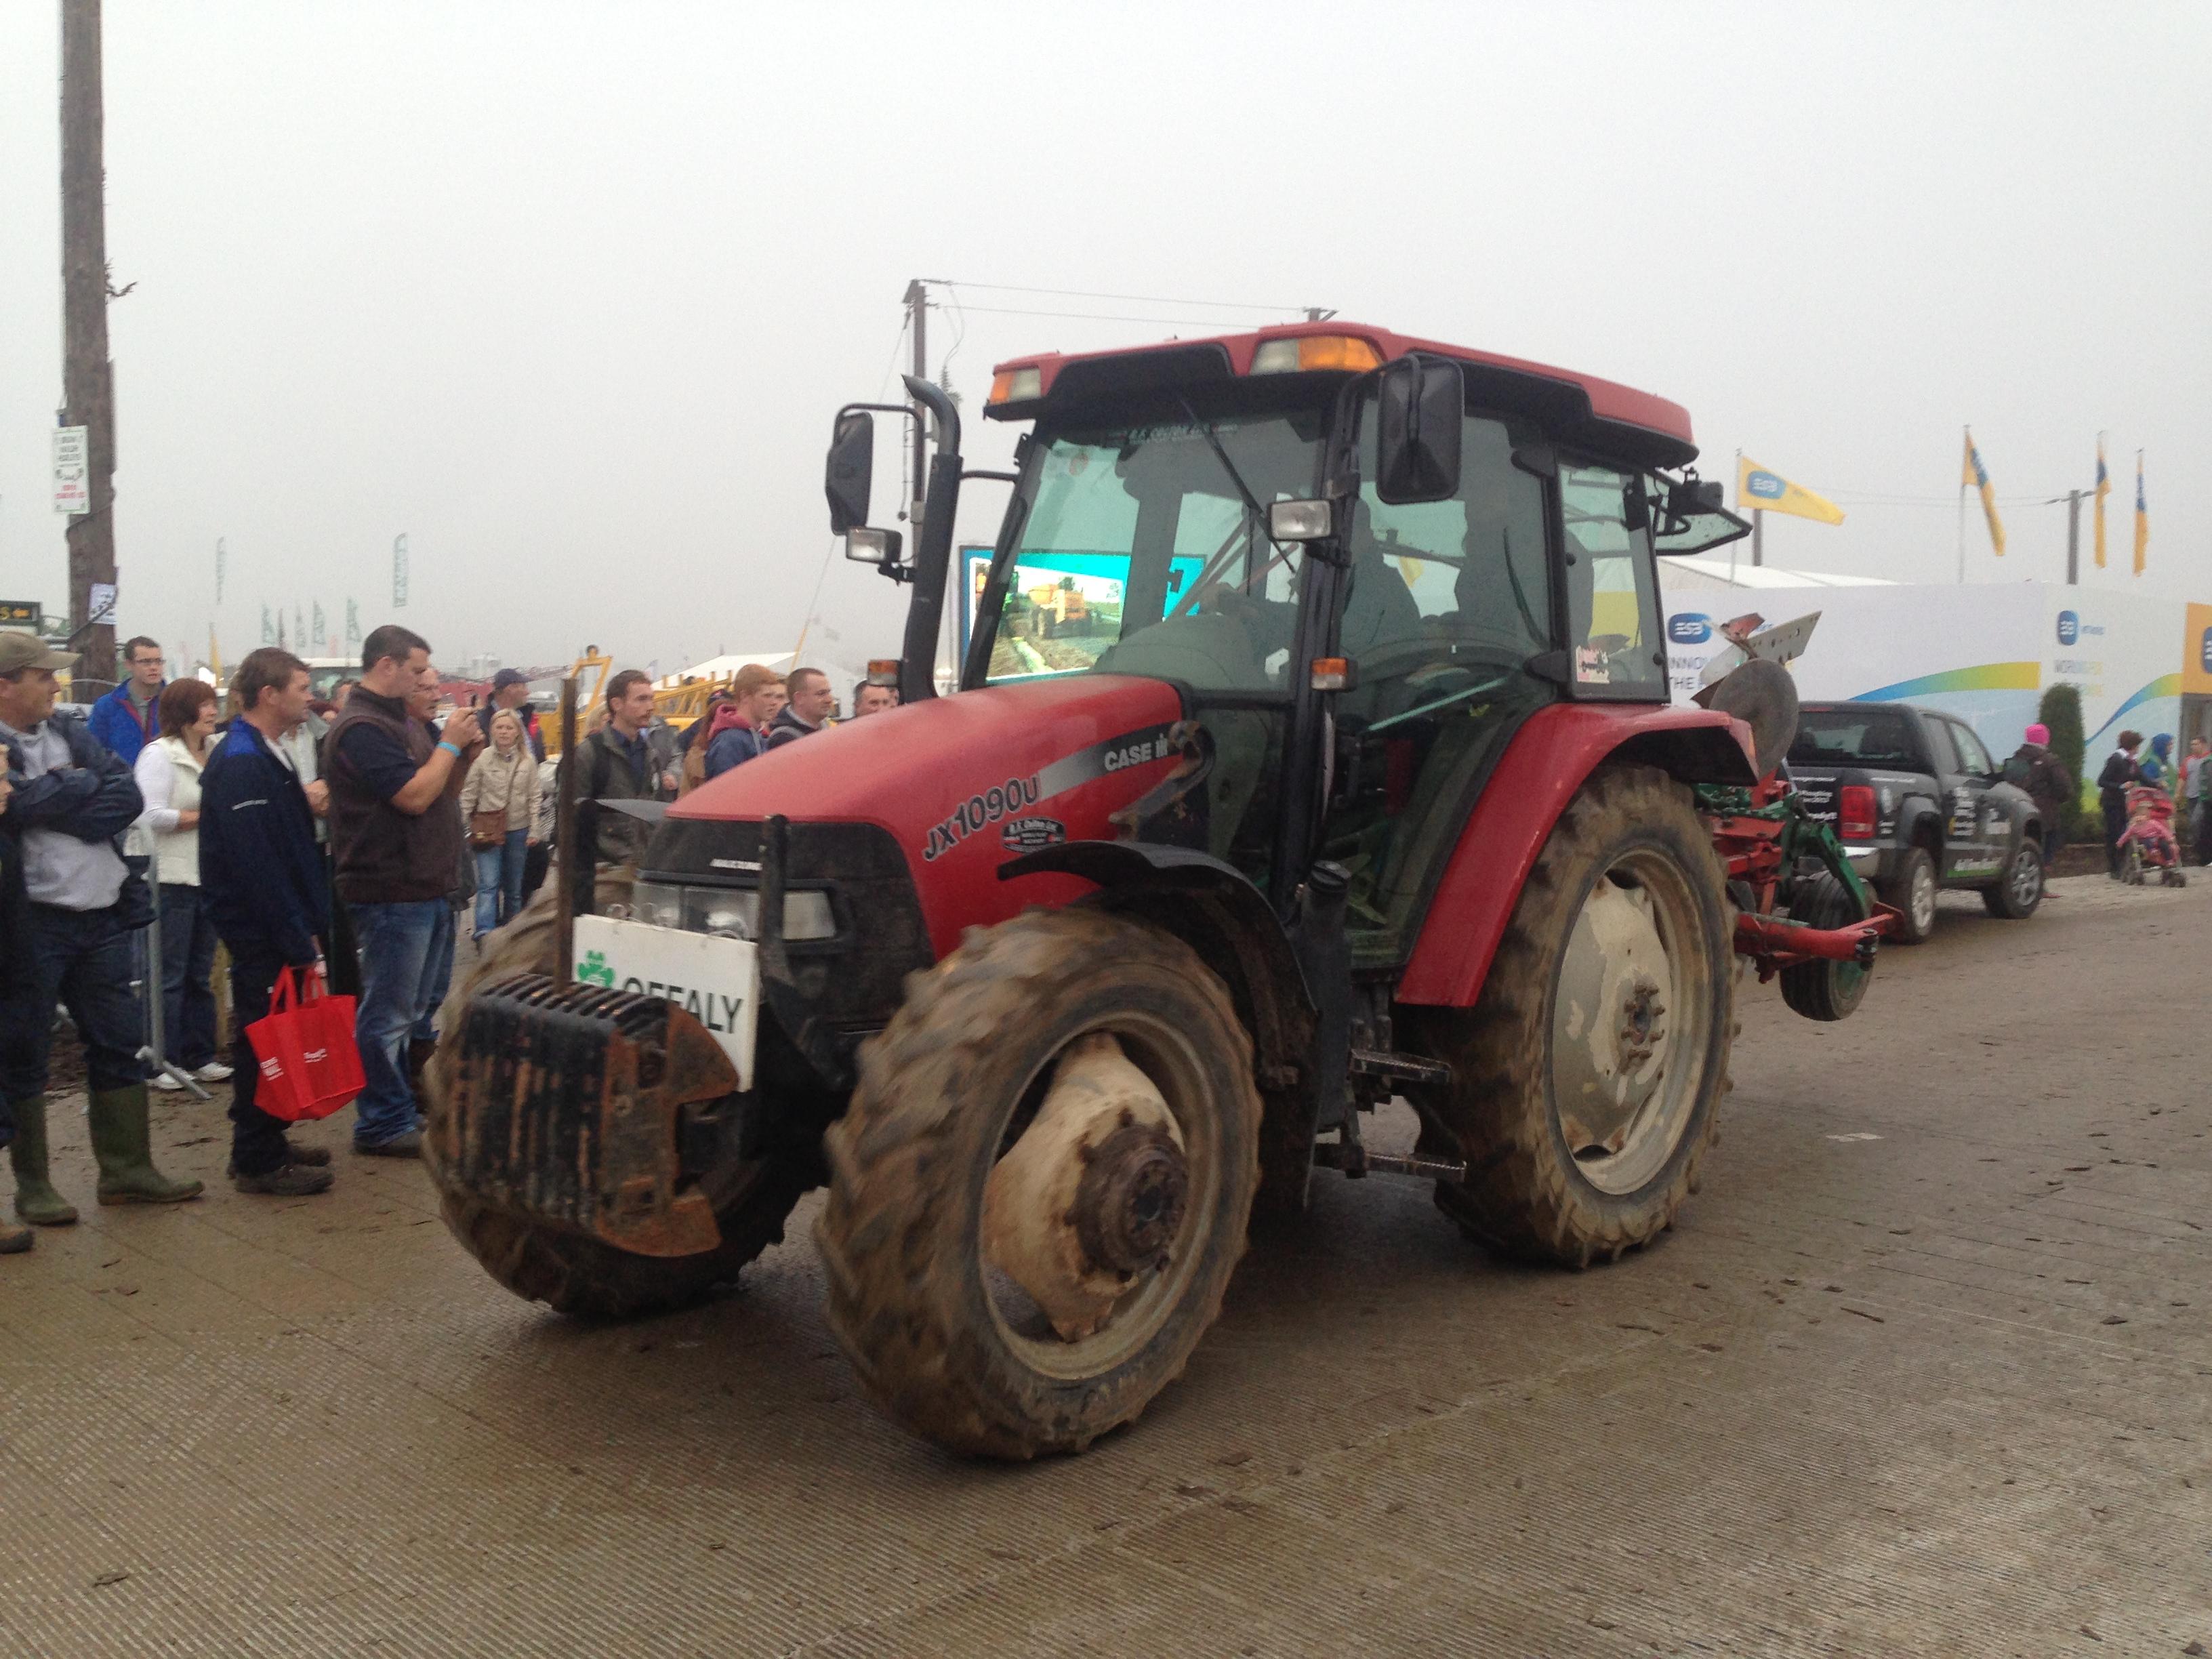 Tractor lap of honour